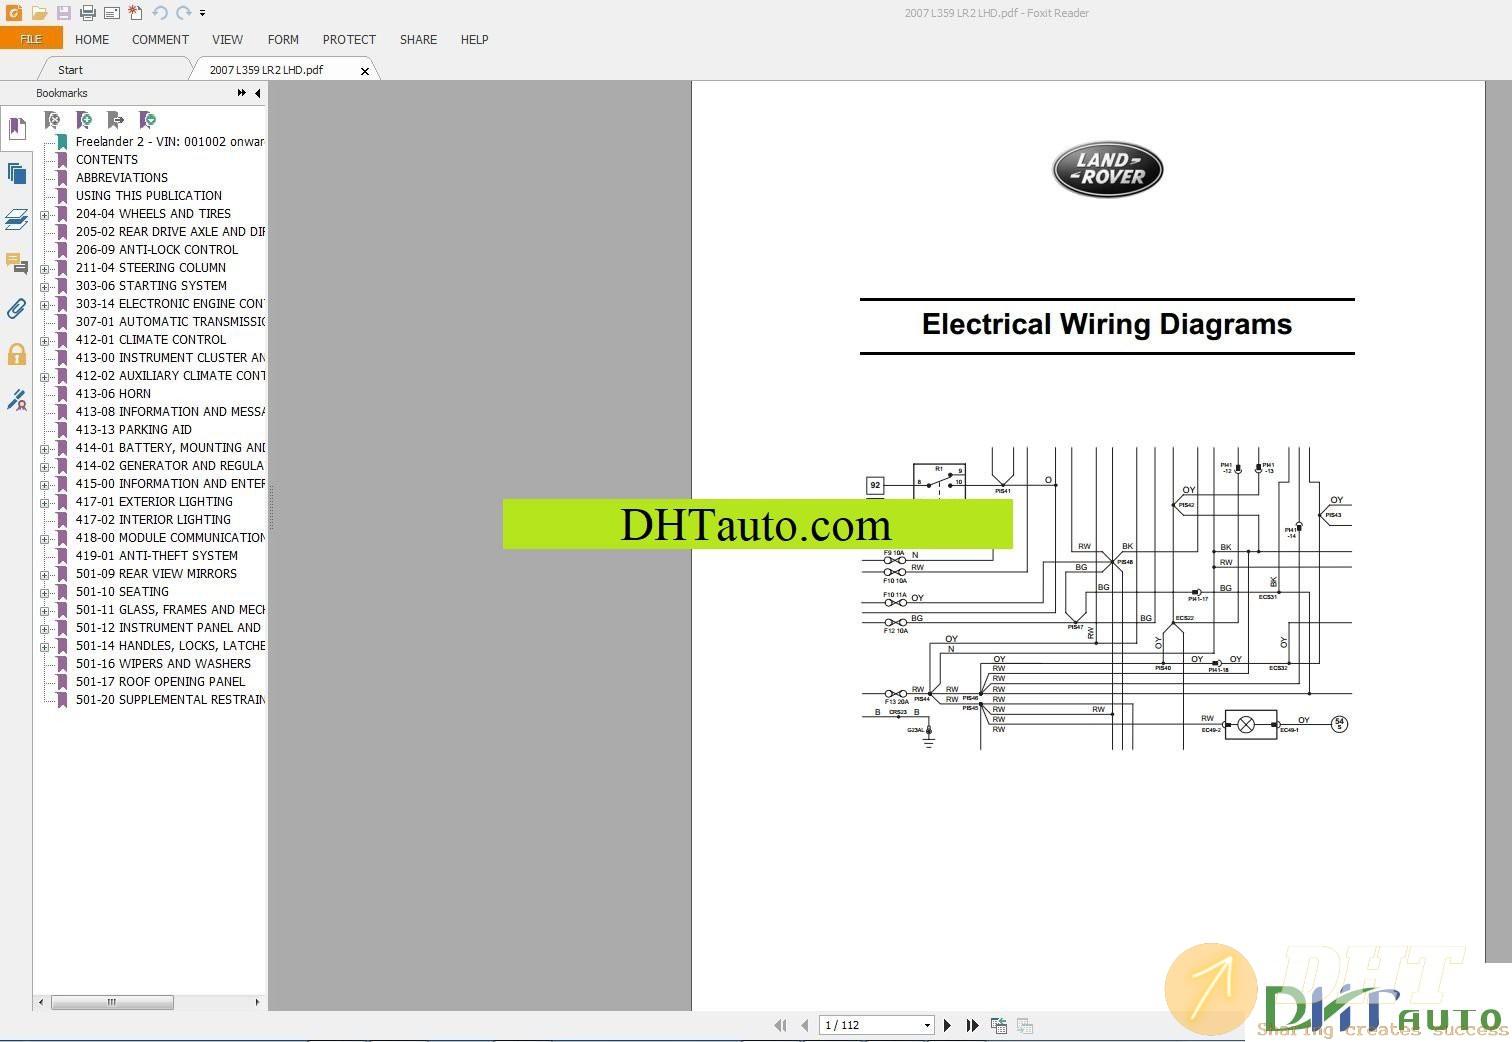 Land-Rover-Range-Rover-Electrical-Wiring-Diagram-1995-2015 2.jpg